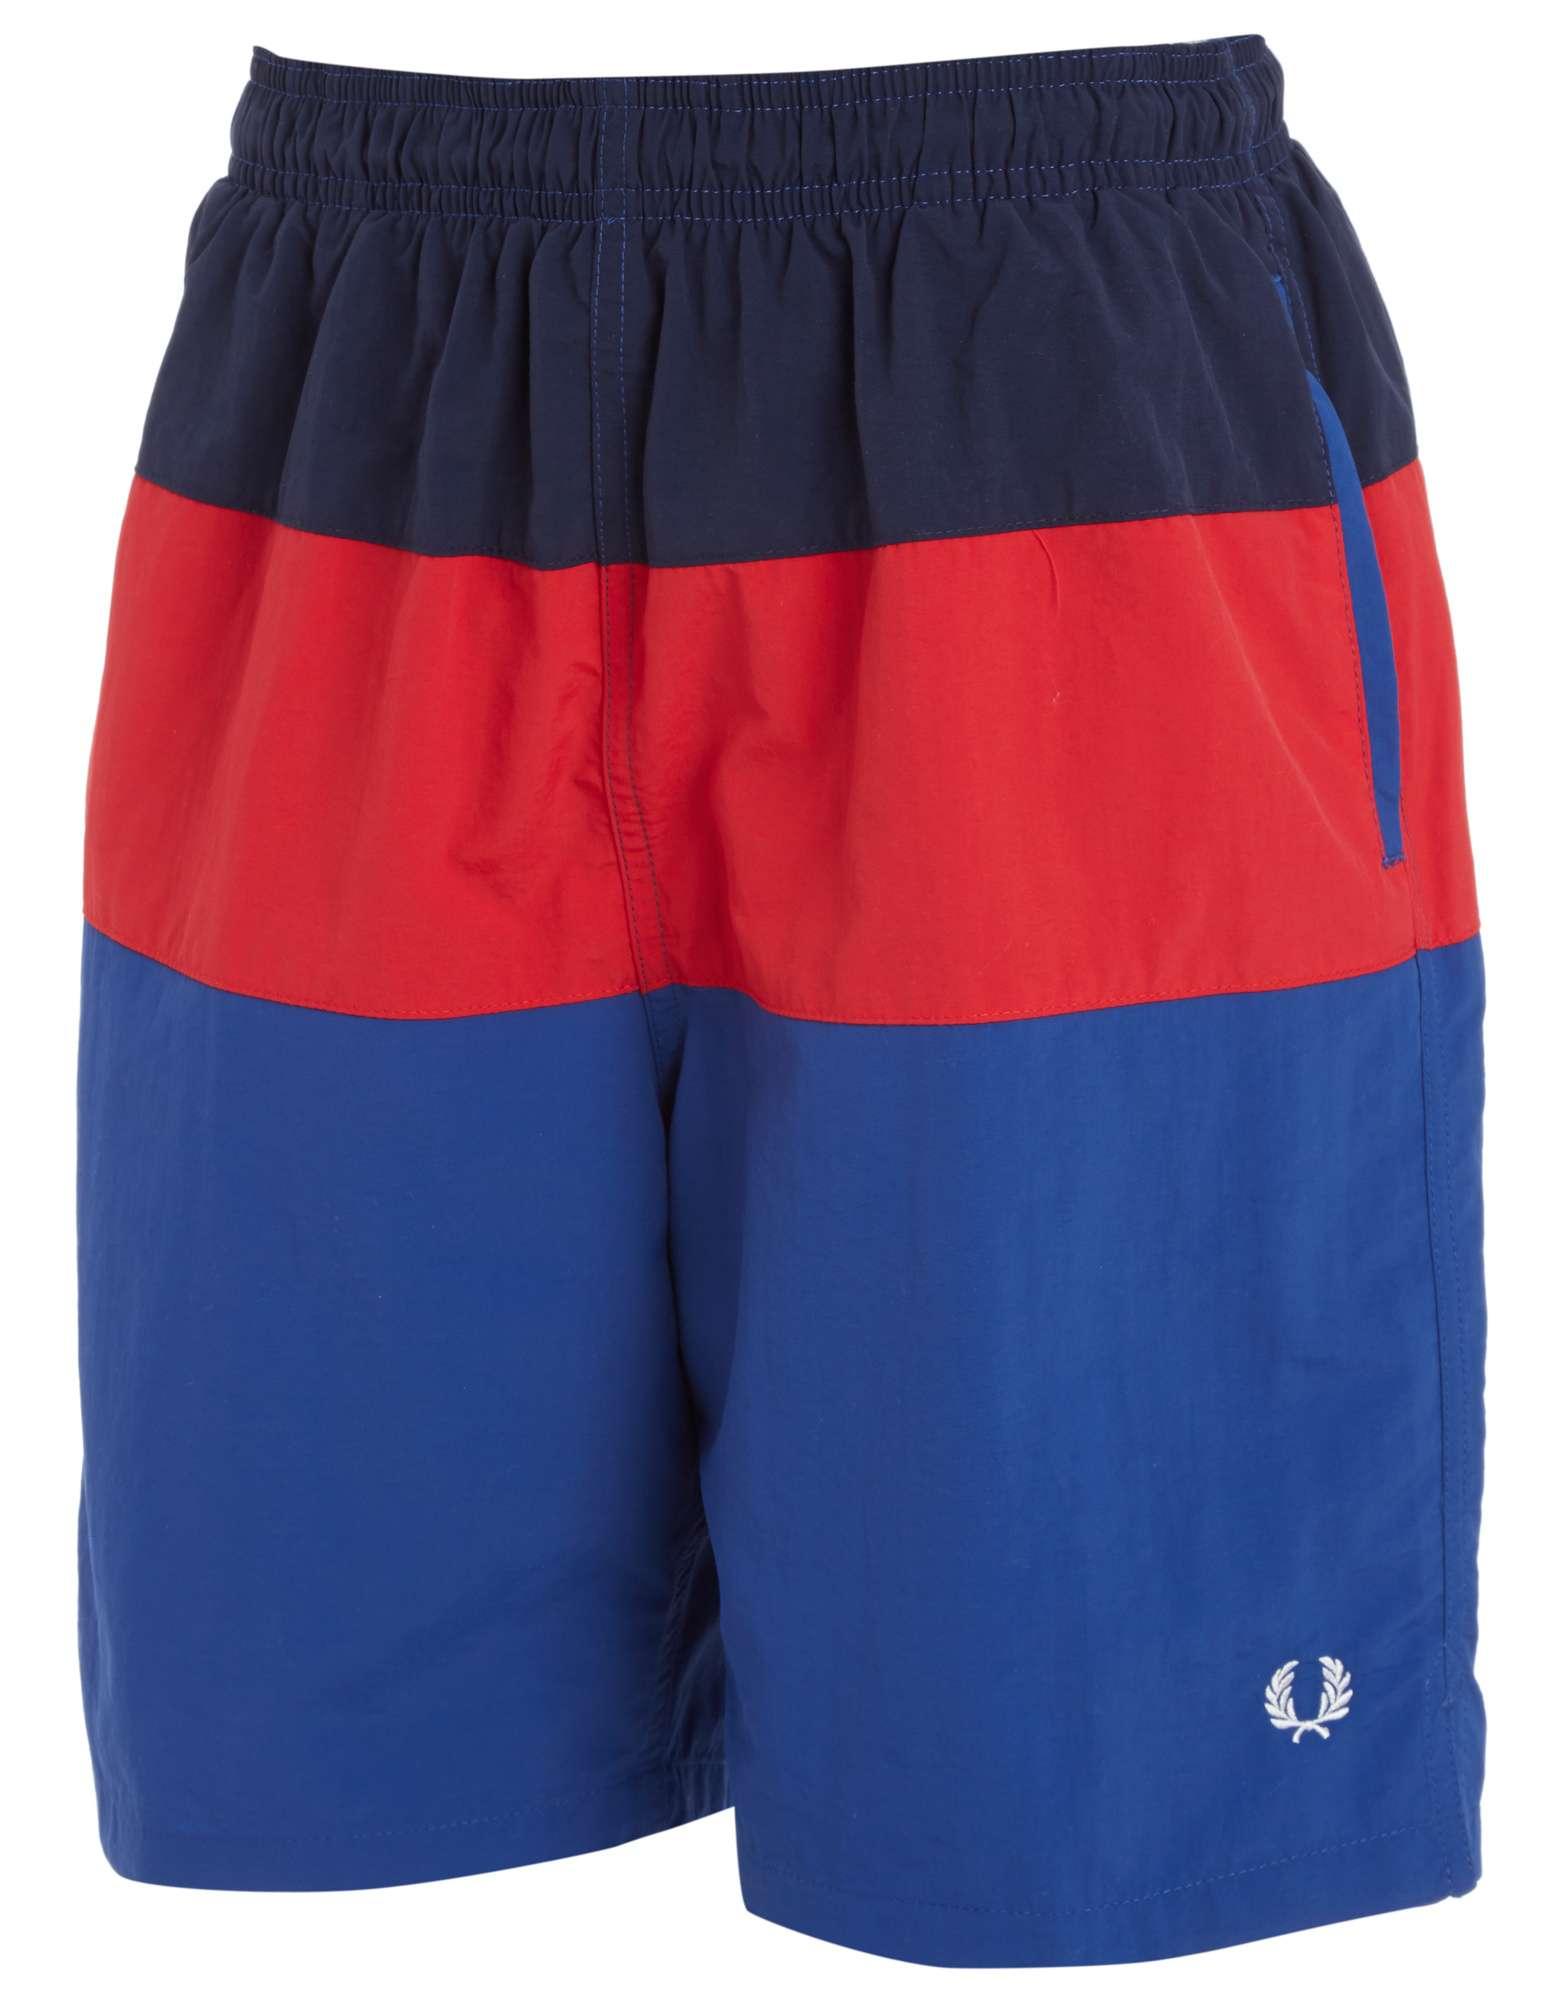 Fred Perry Colour Block Swim Shorts Junior